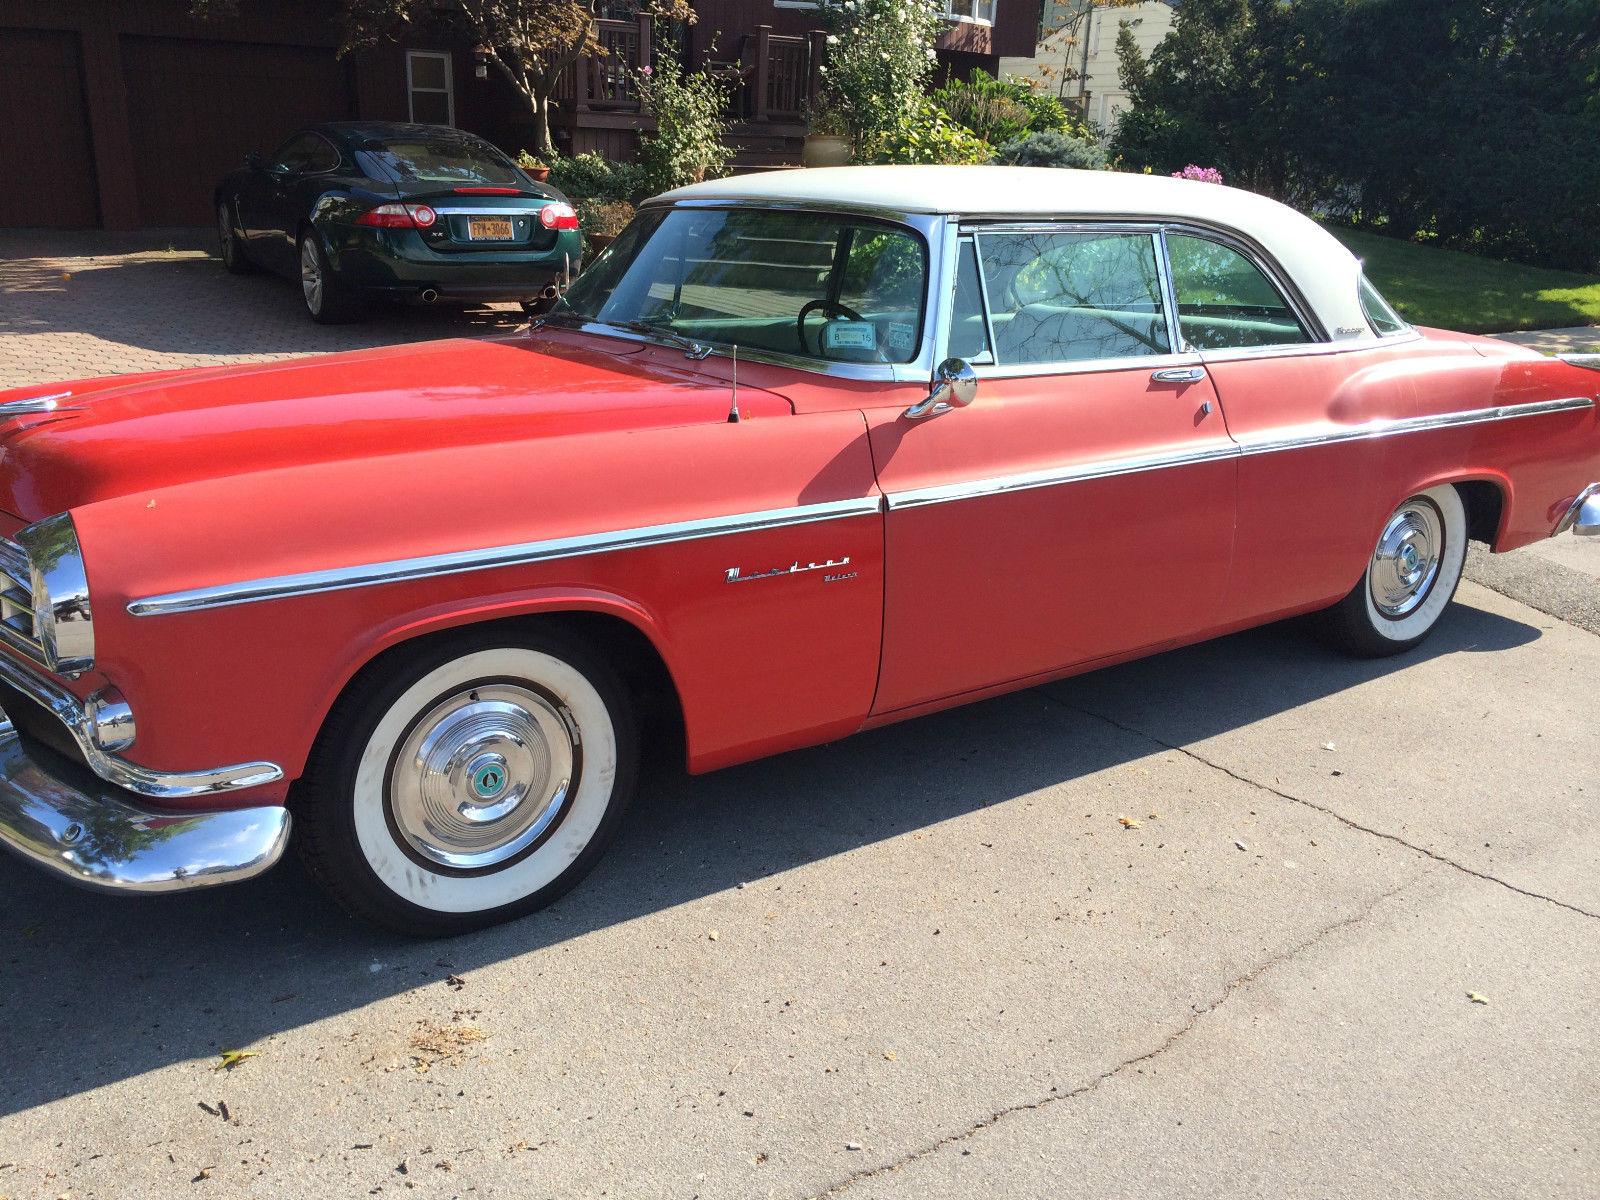 1955 Chrysler Windsor Deluxe, Ltd Production Nassau Edition (A True ...